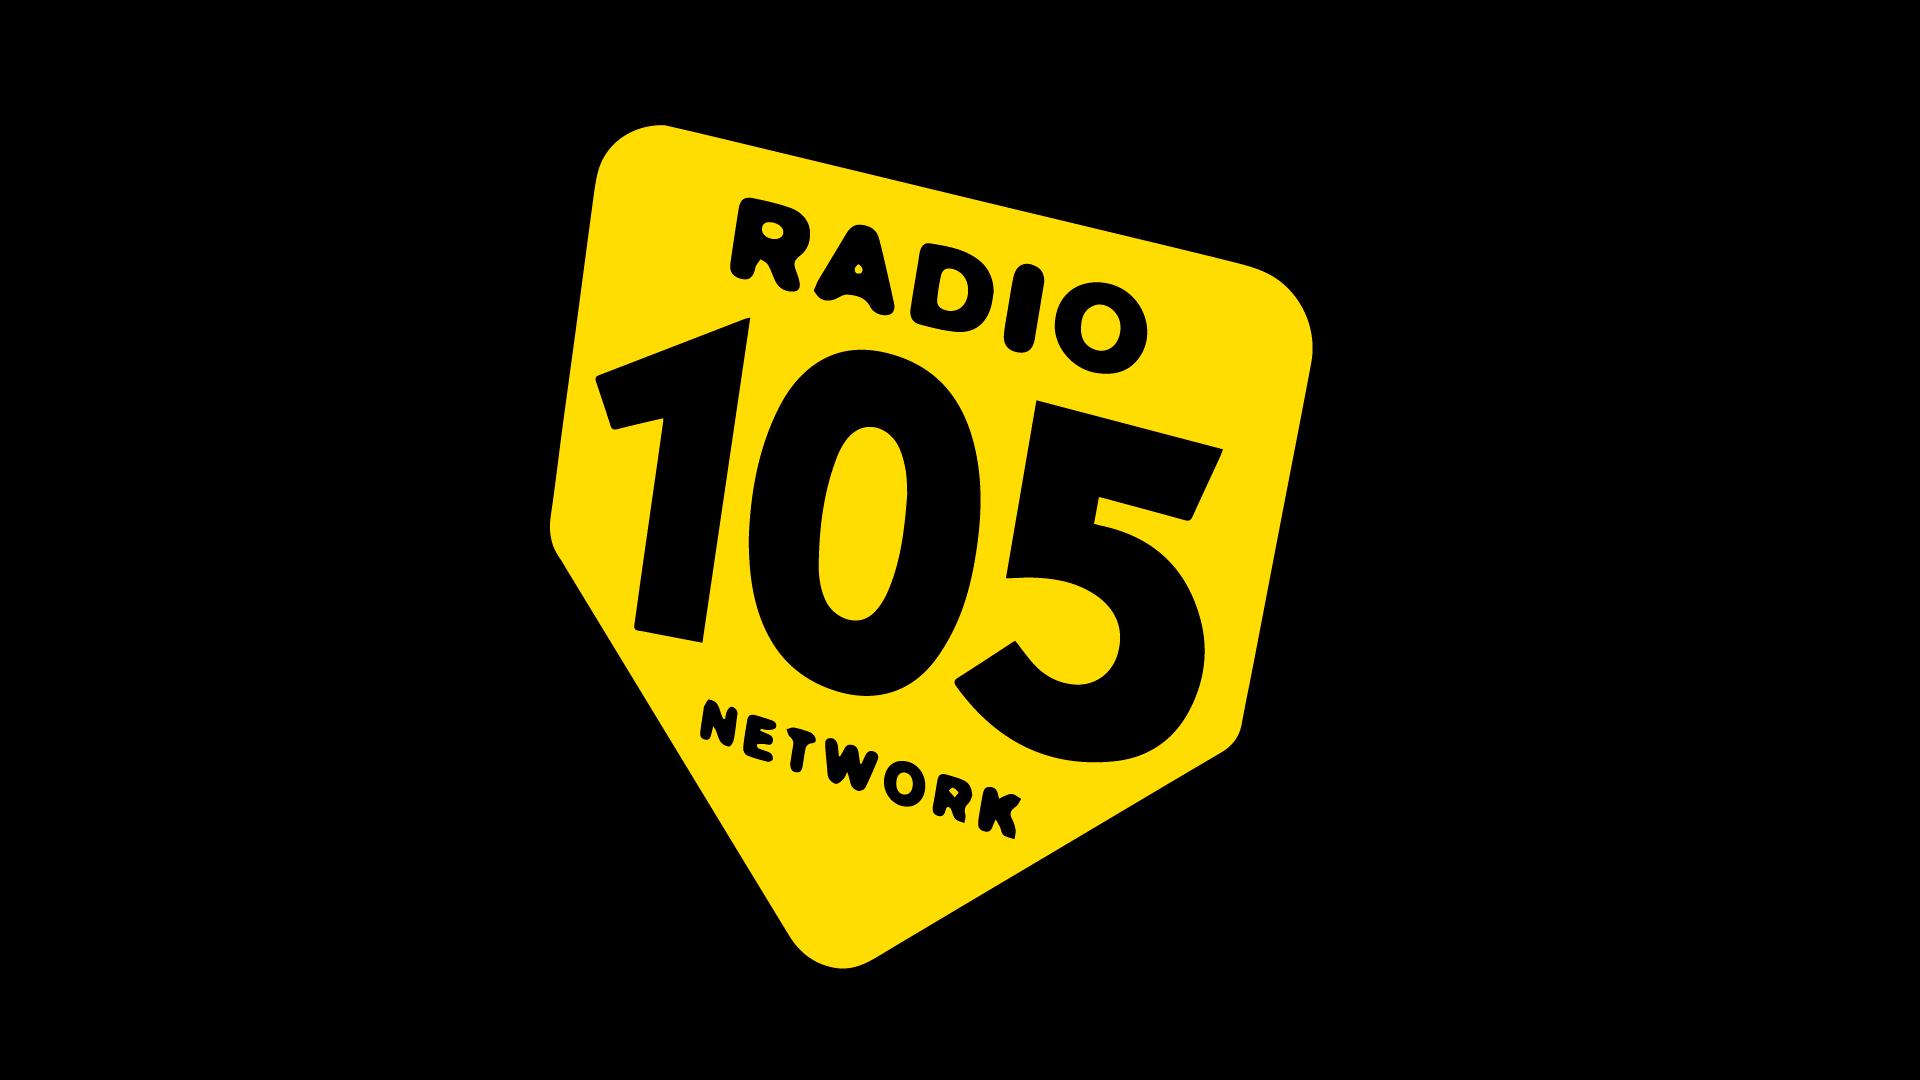 Radio 105 Tv Italia in diretta, live